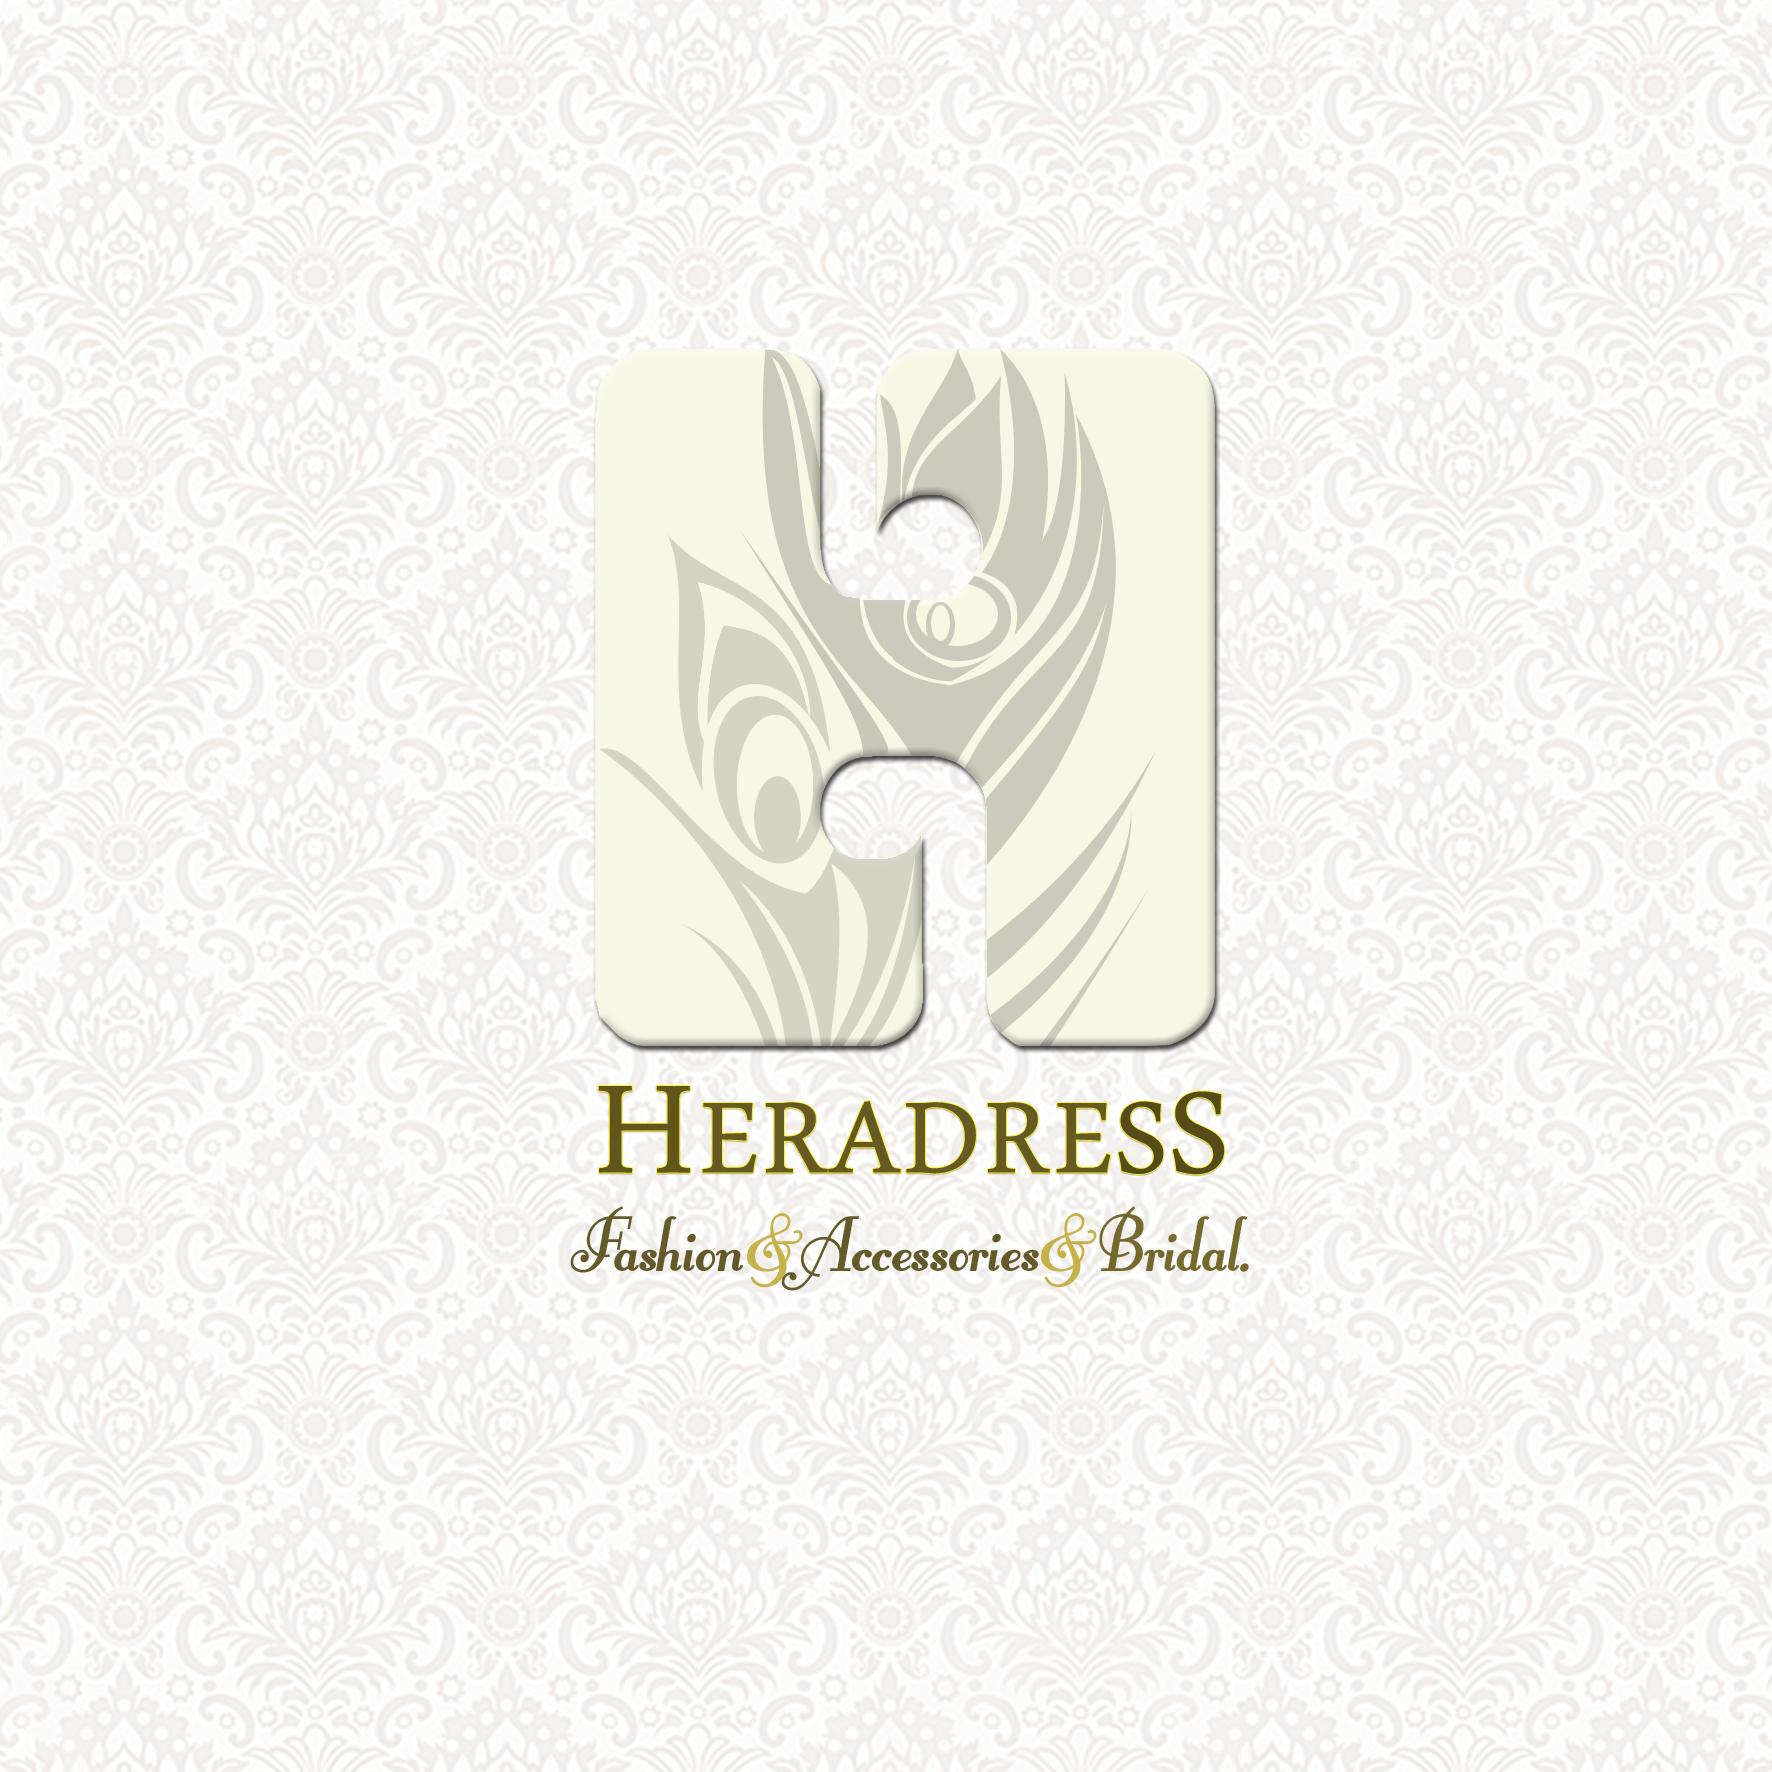 Heradress